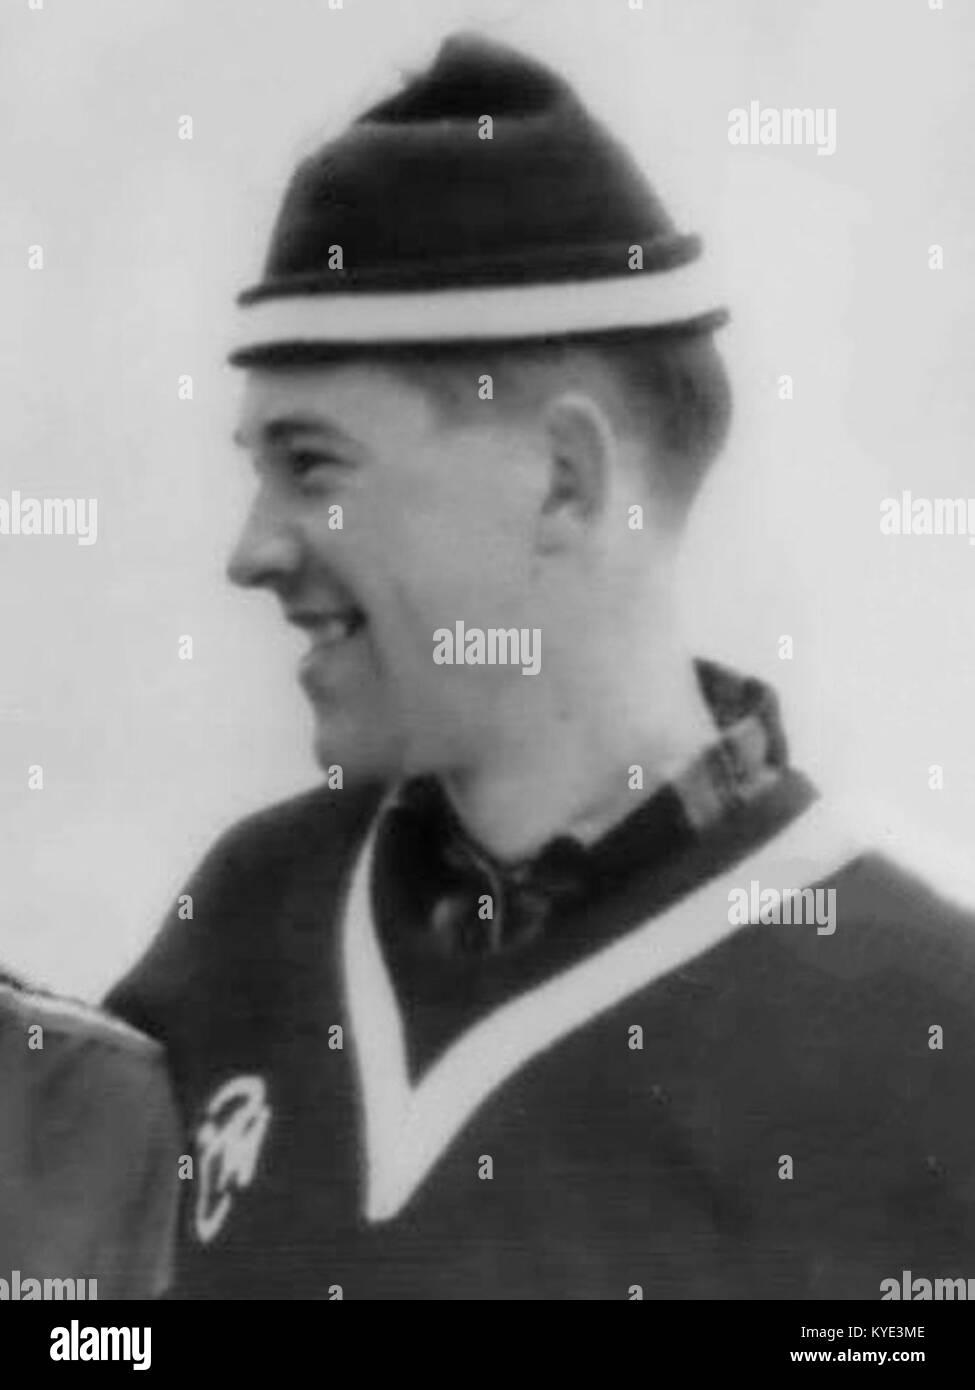 Torbjørn Yggeseth 1960b - Stock Image